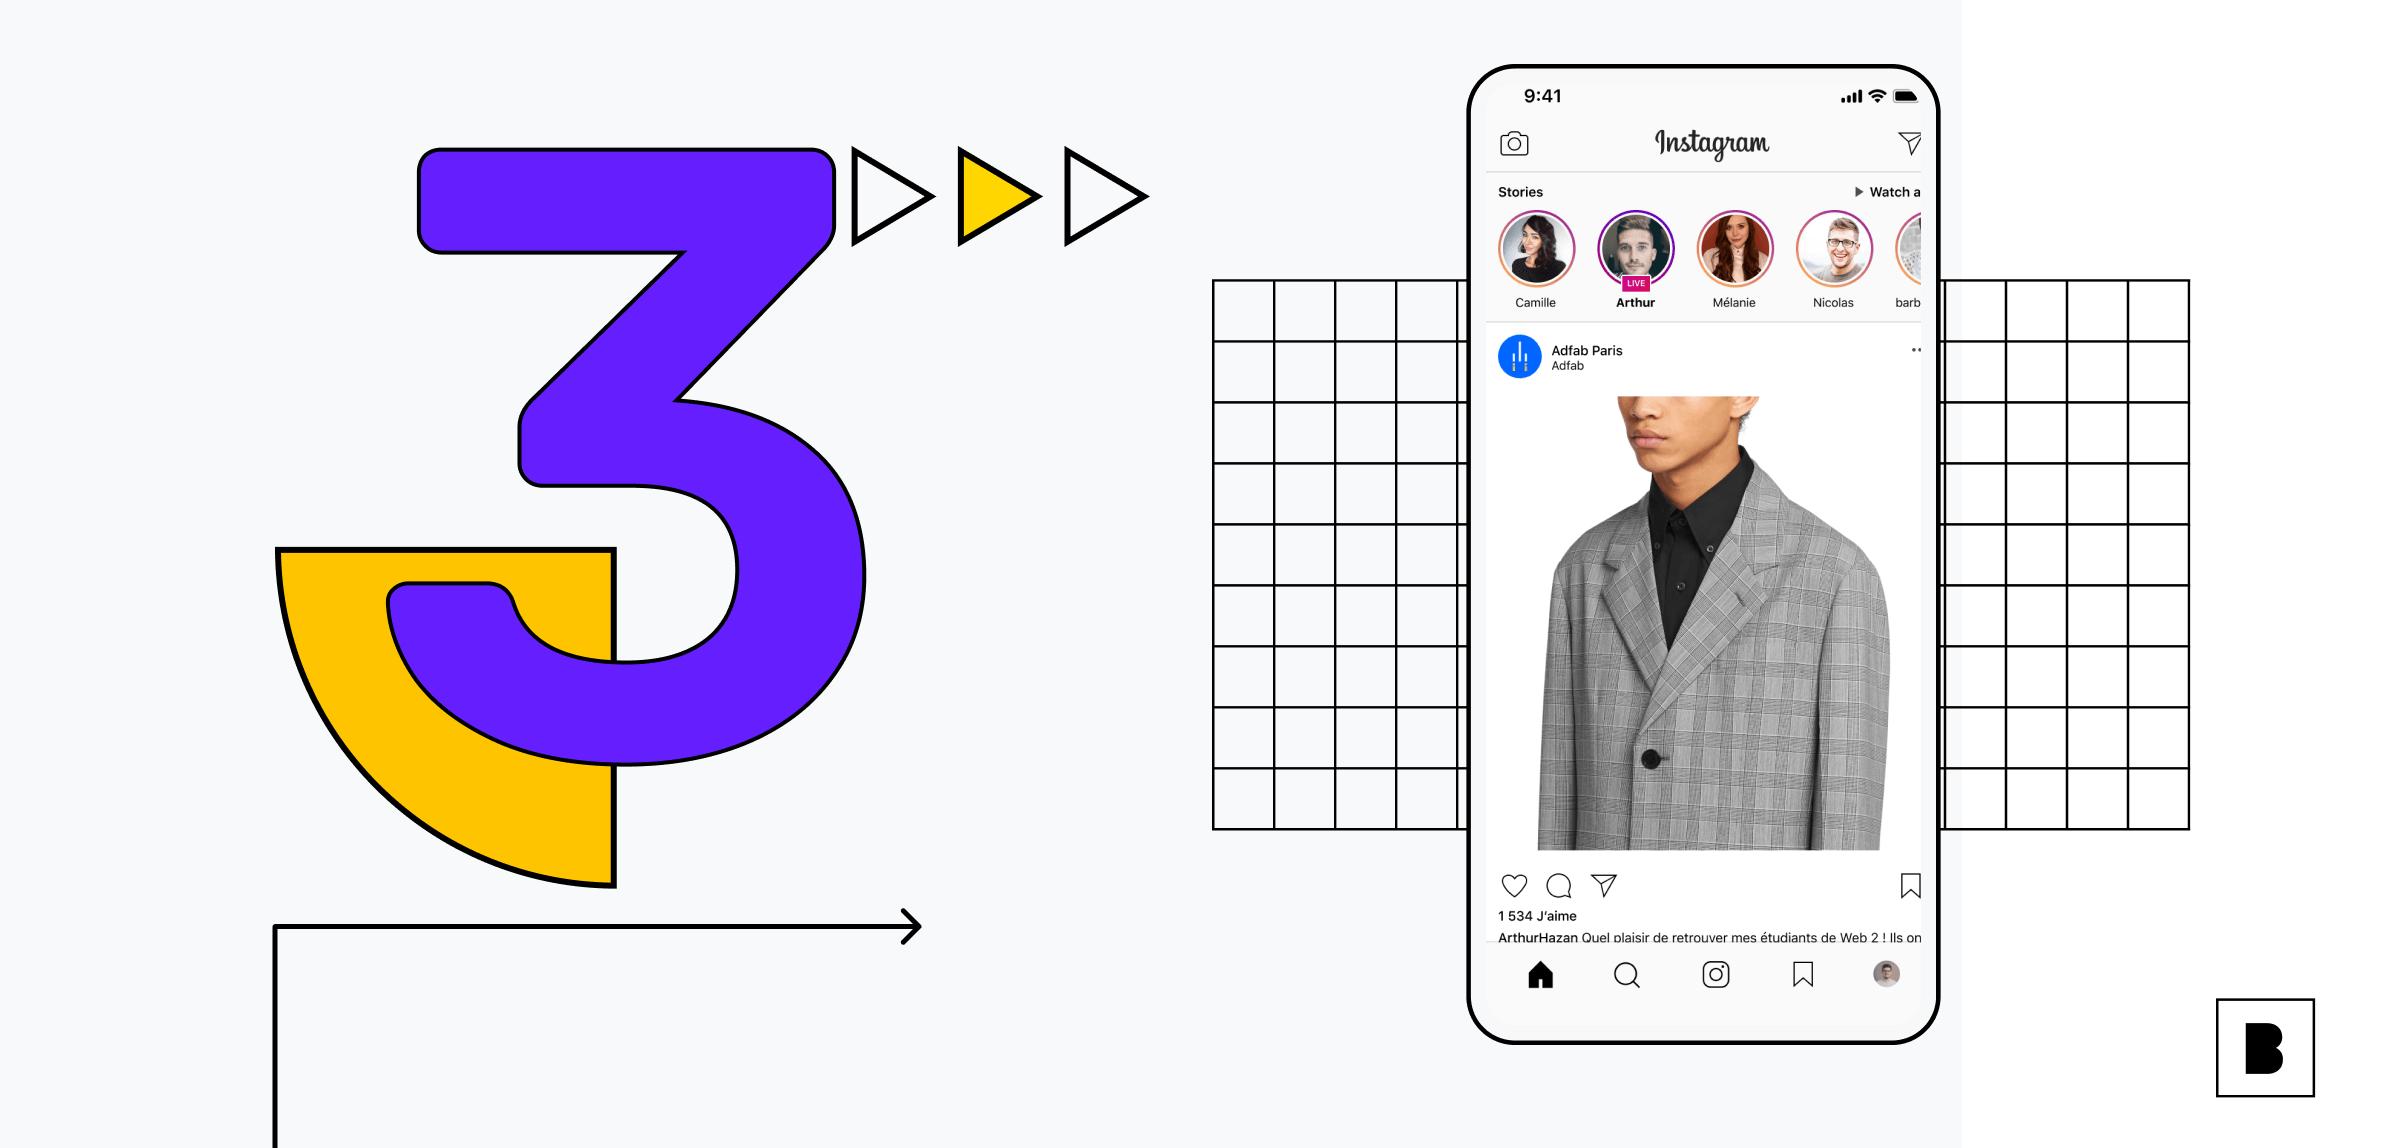 3 ways apps will improve your social media marketing